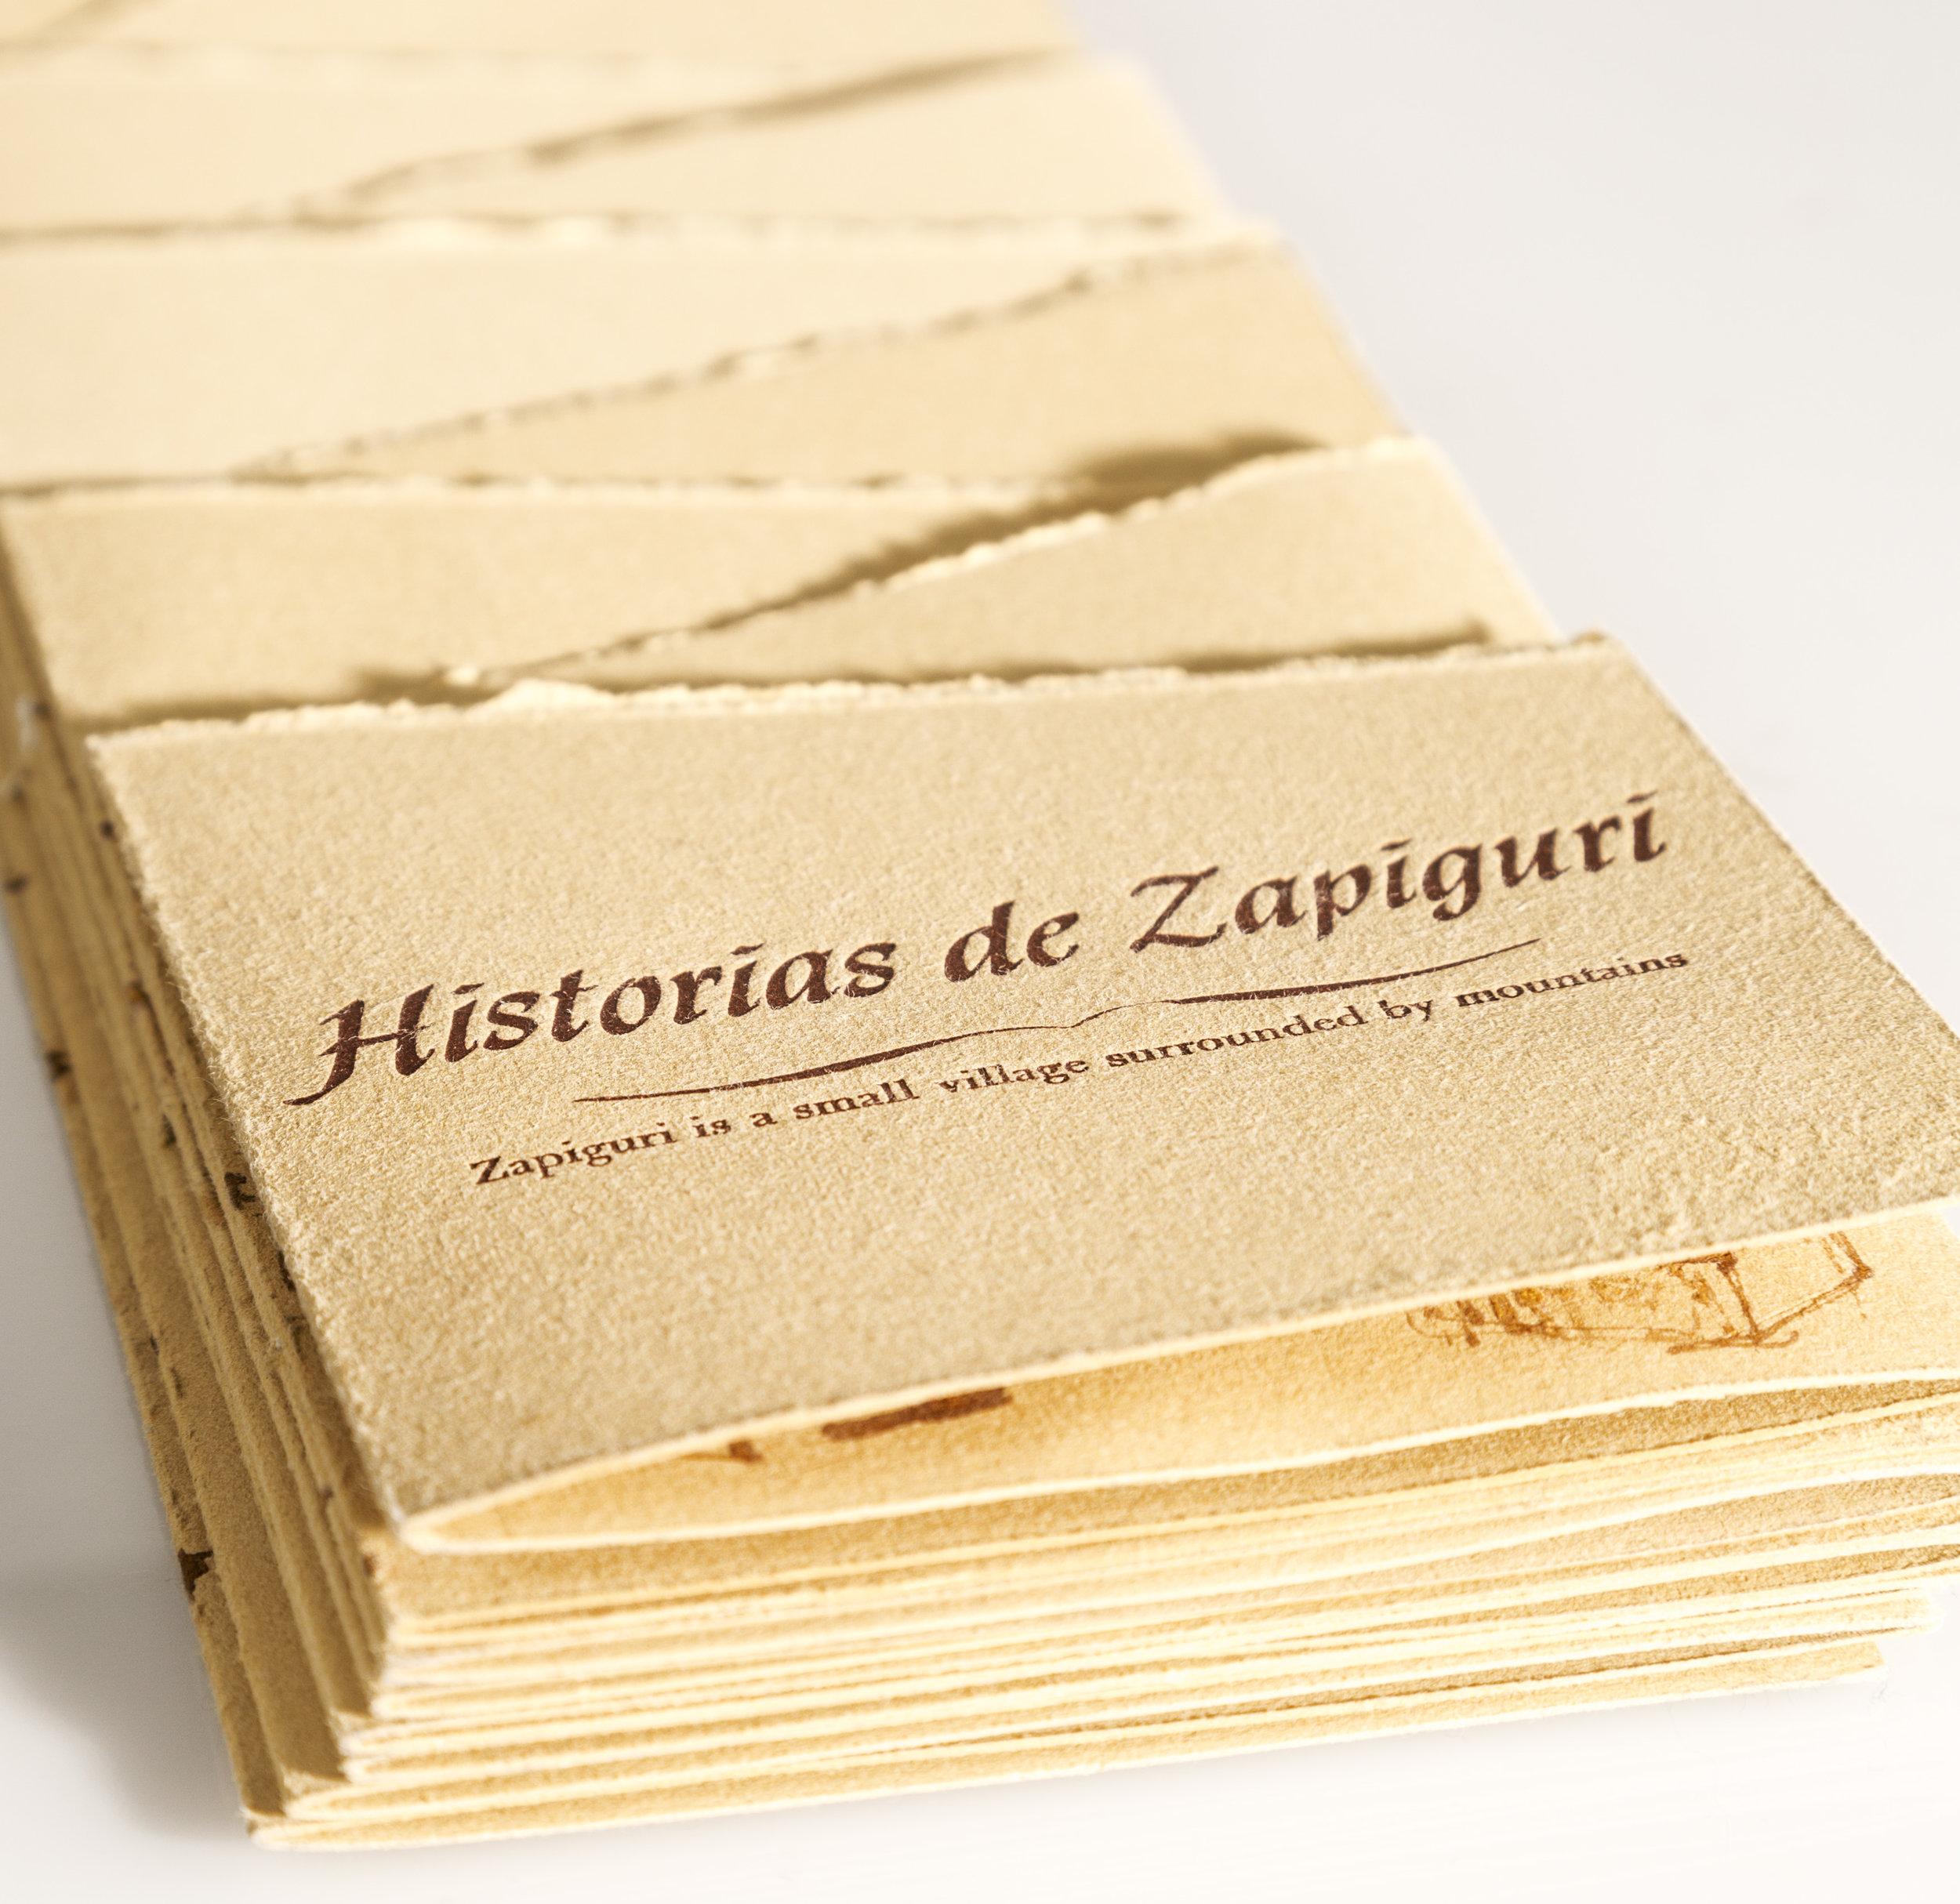 Historias de Zapiguri-WR-09-1.jpg